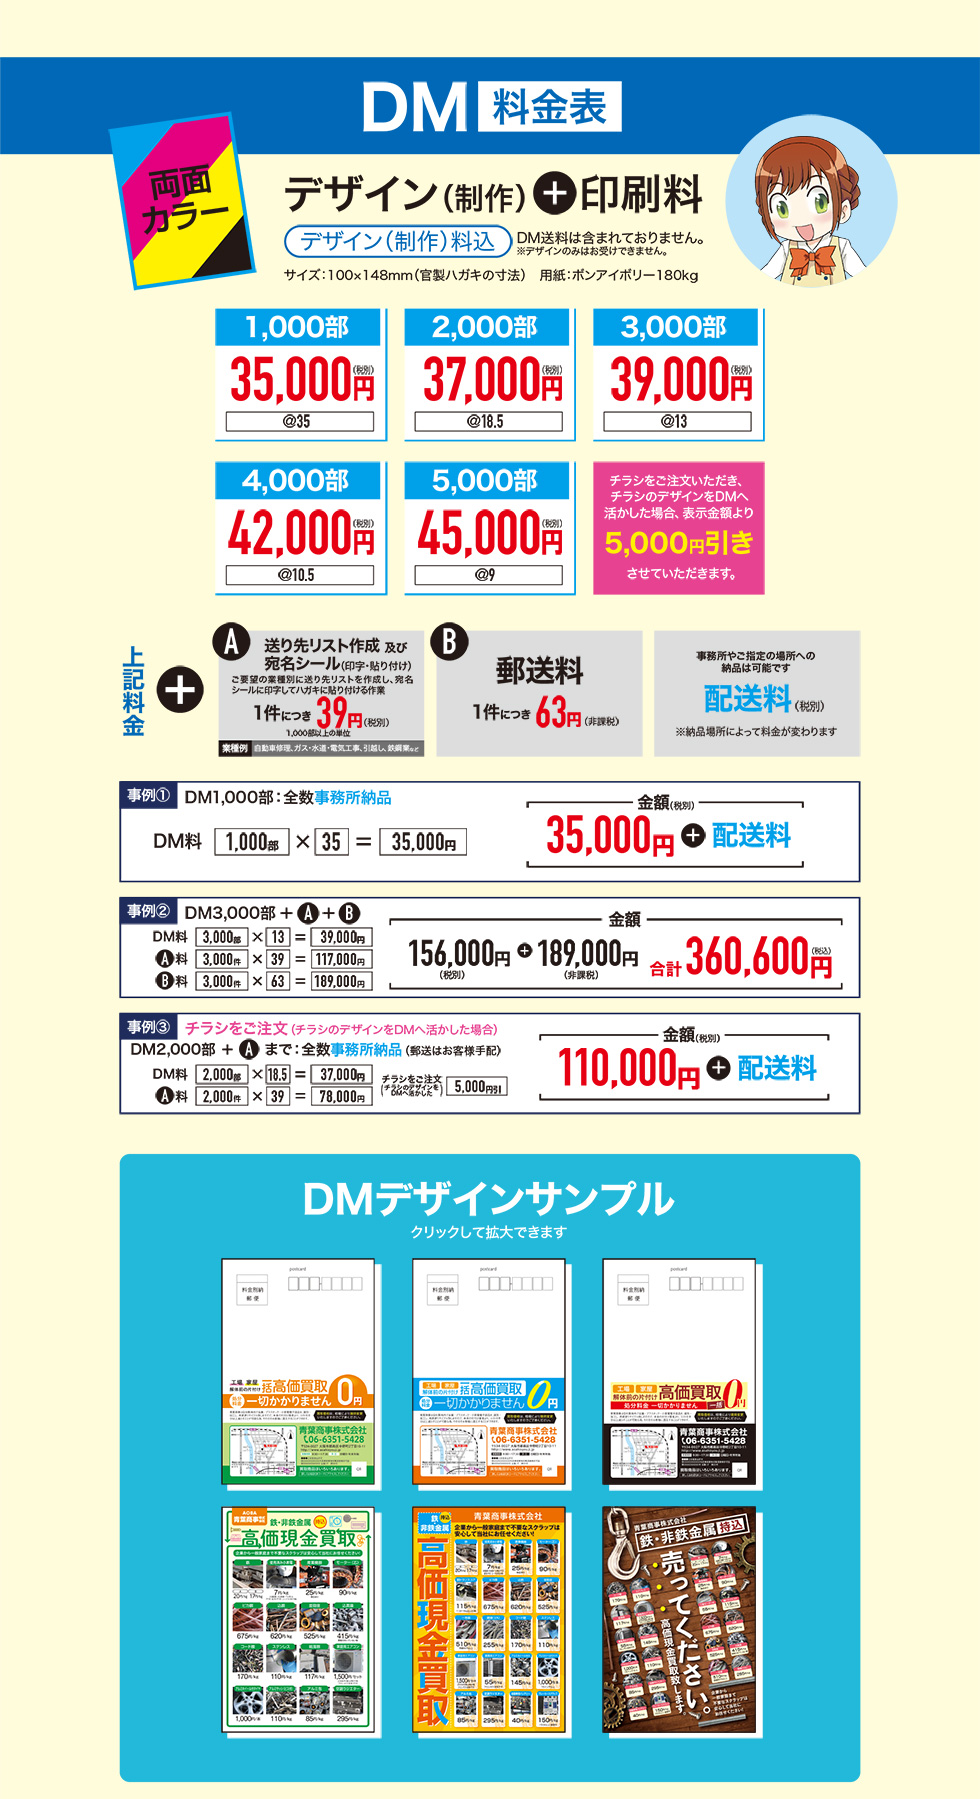 DMデザインサンプル